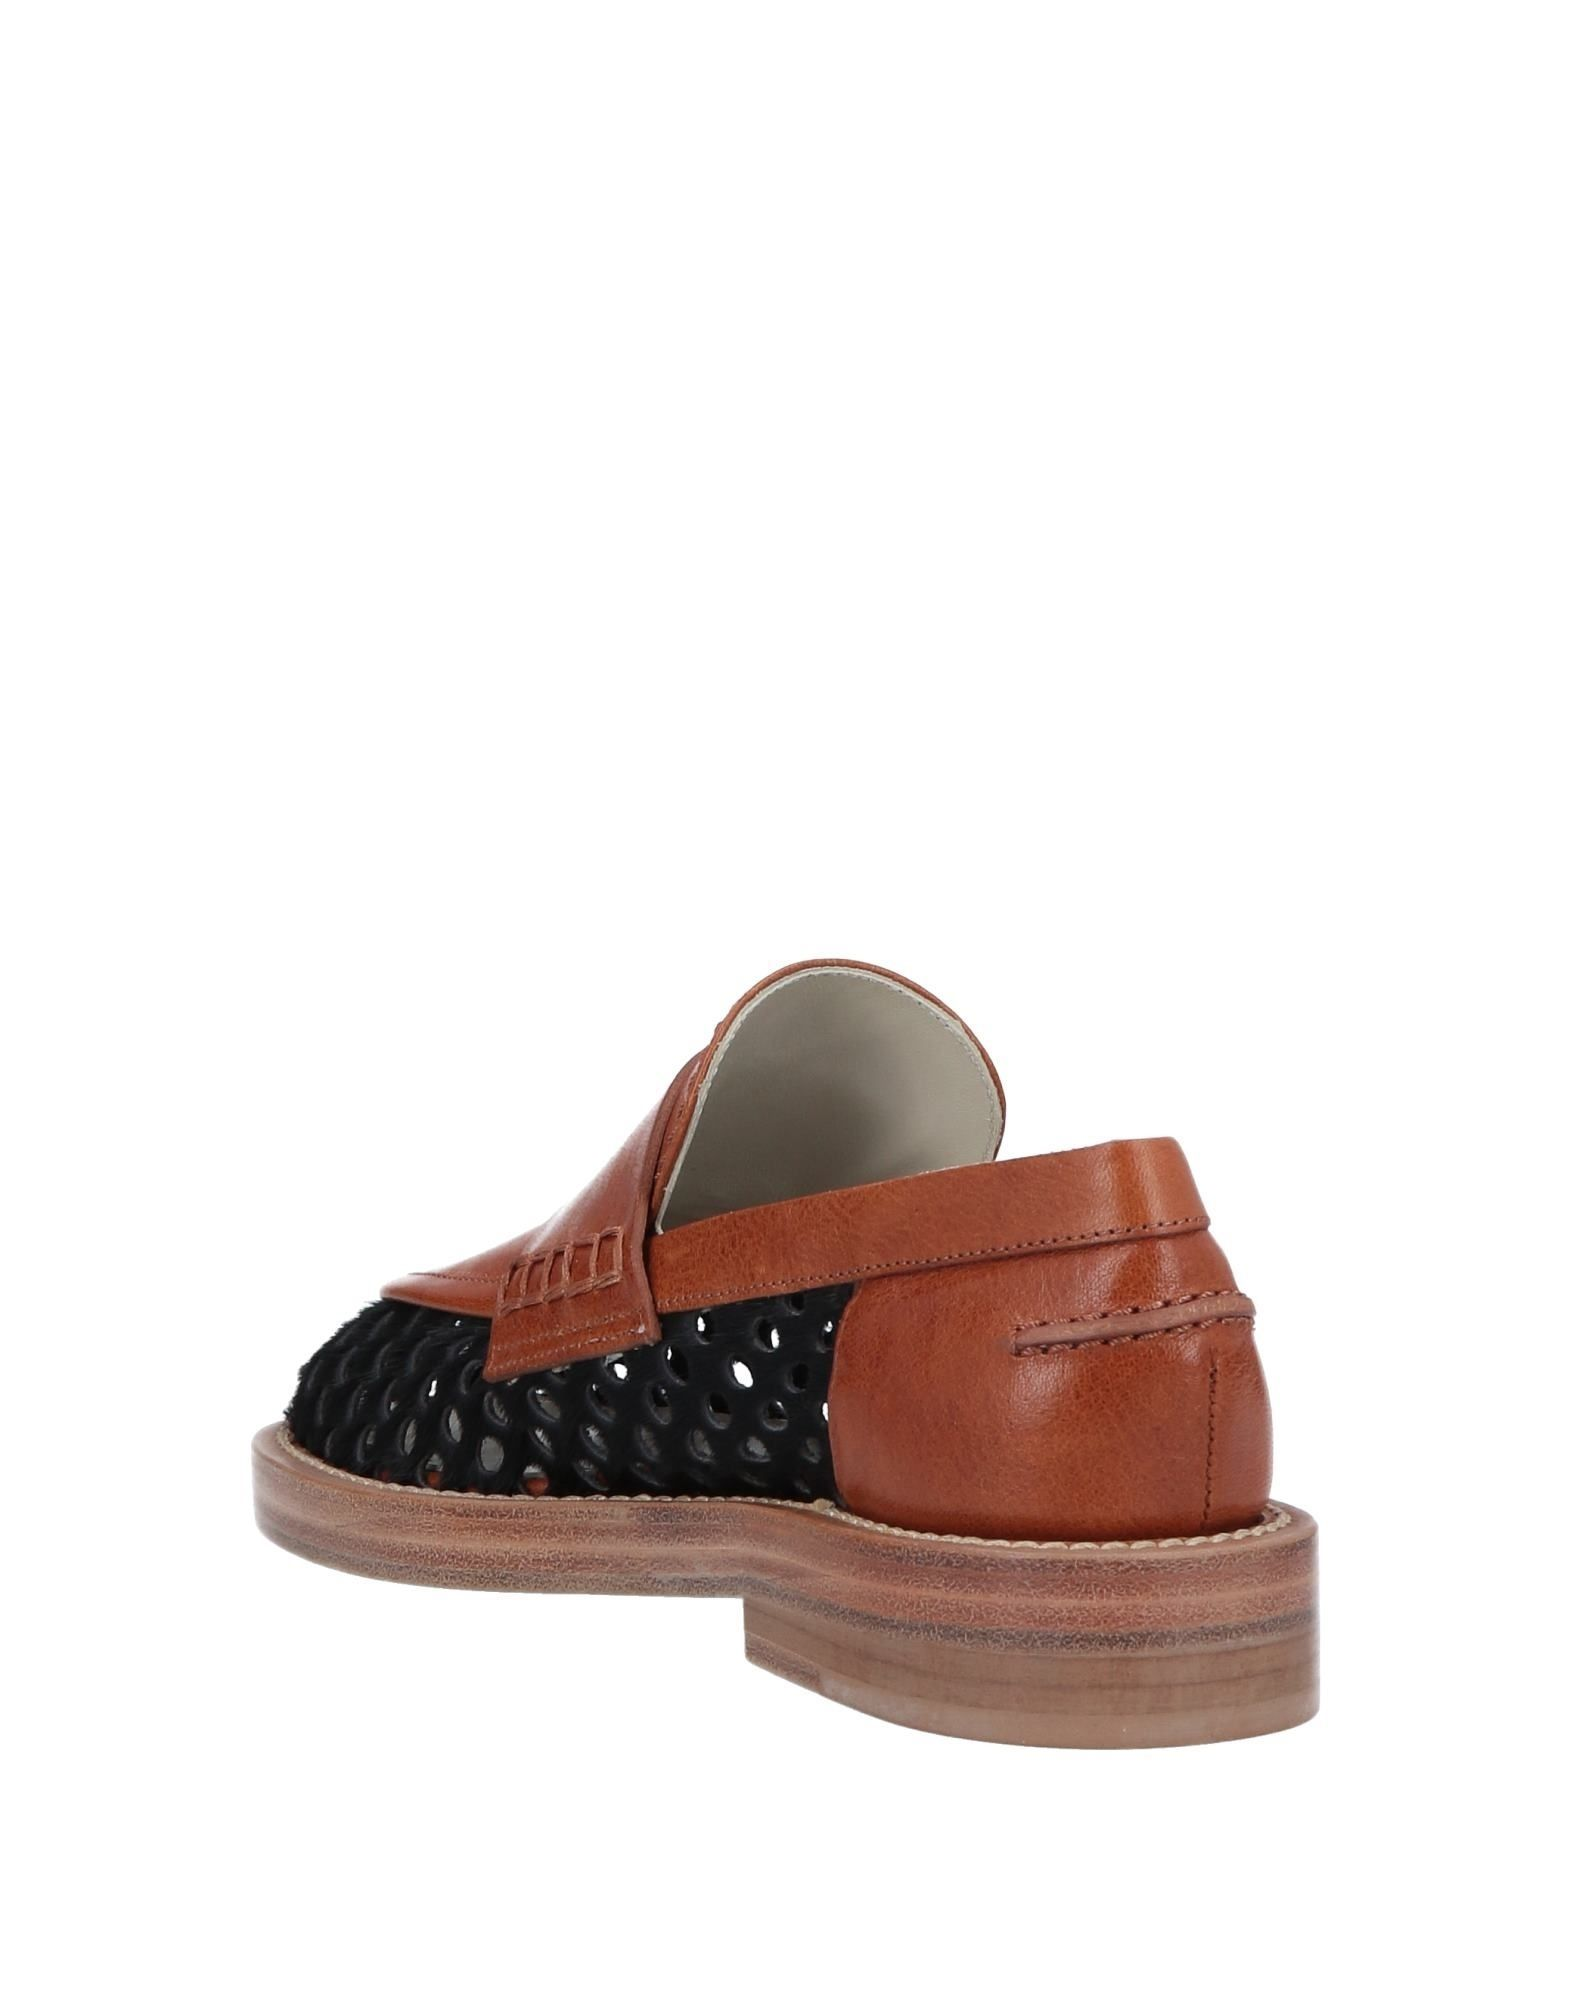 Marni Black Calf Leather Loafers